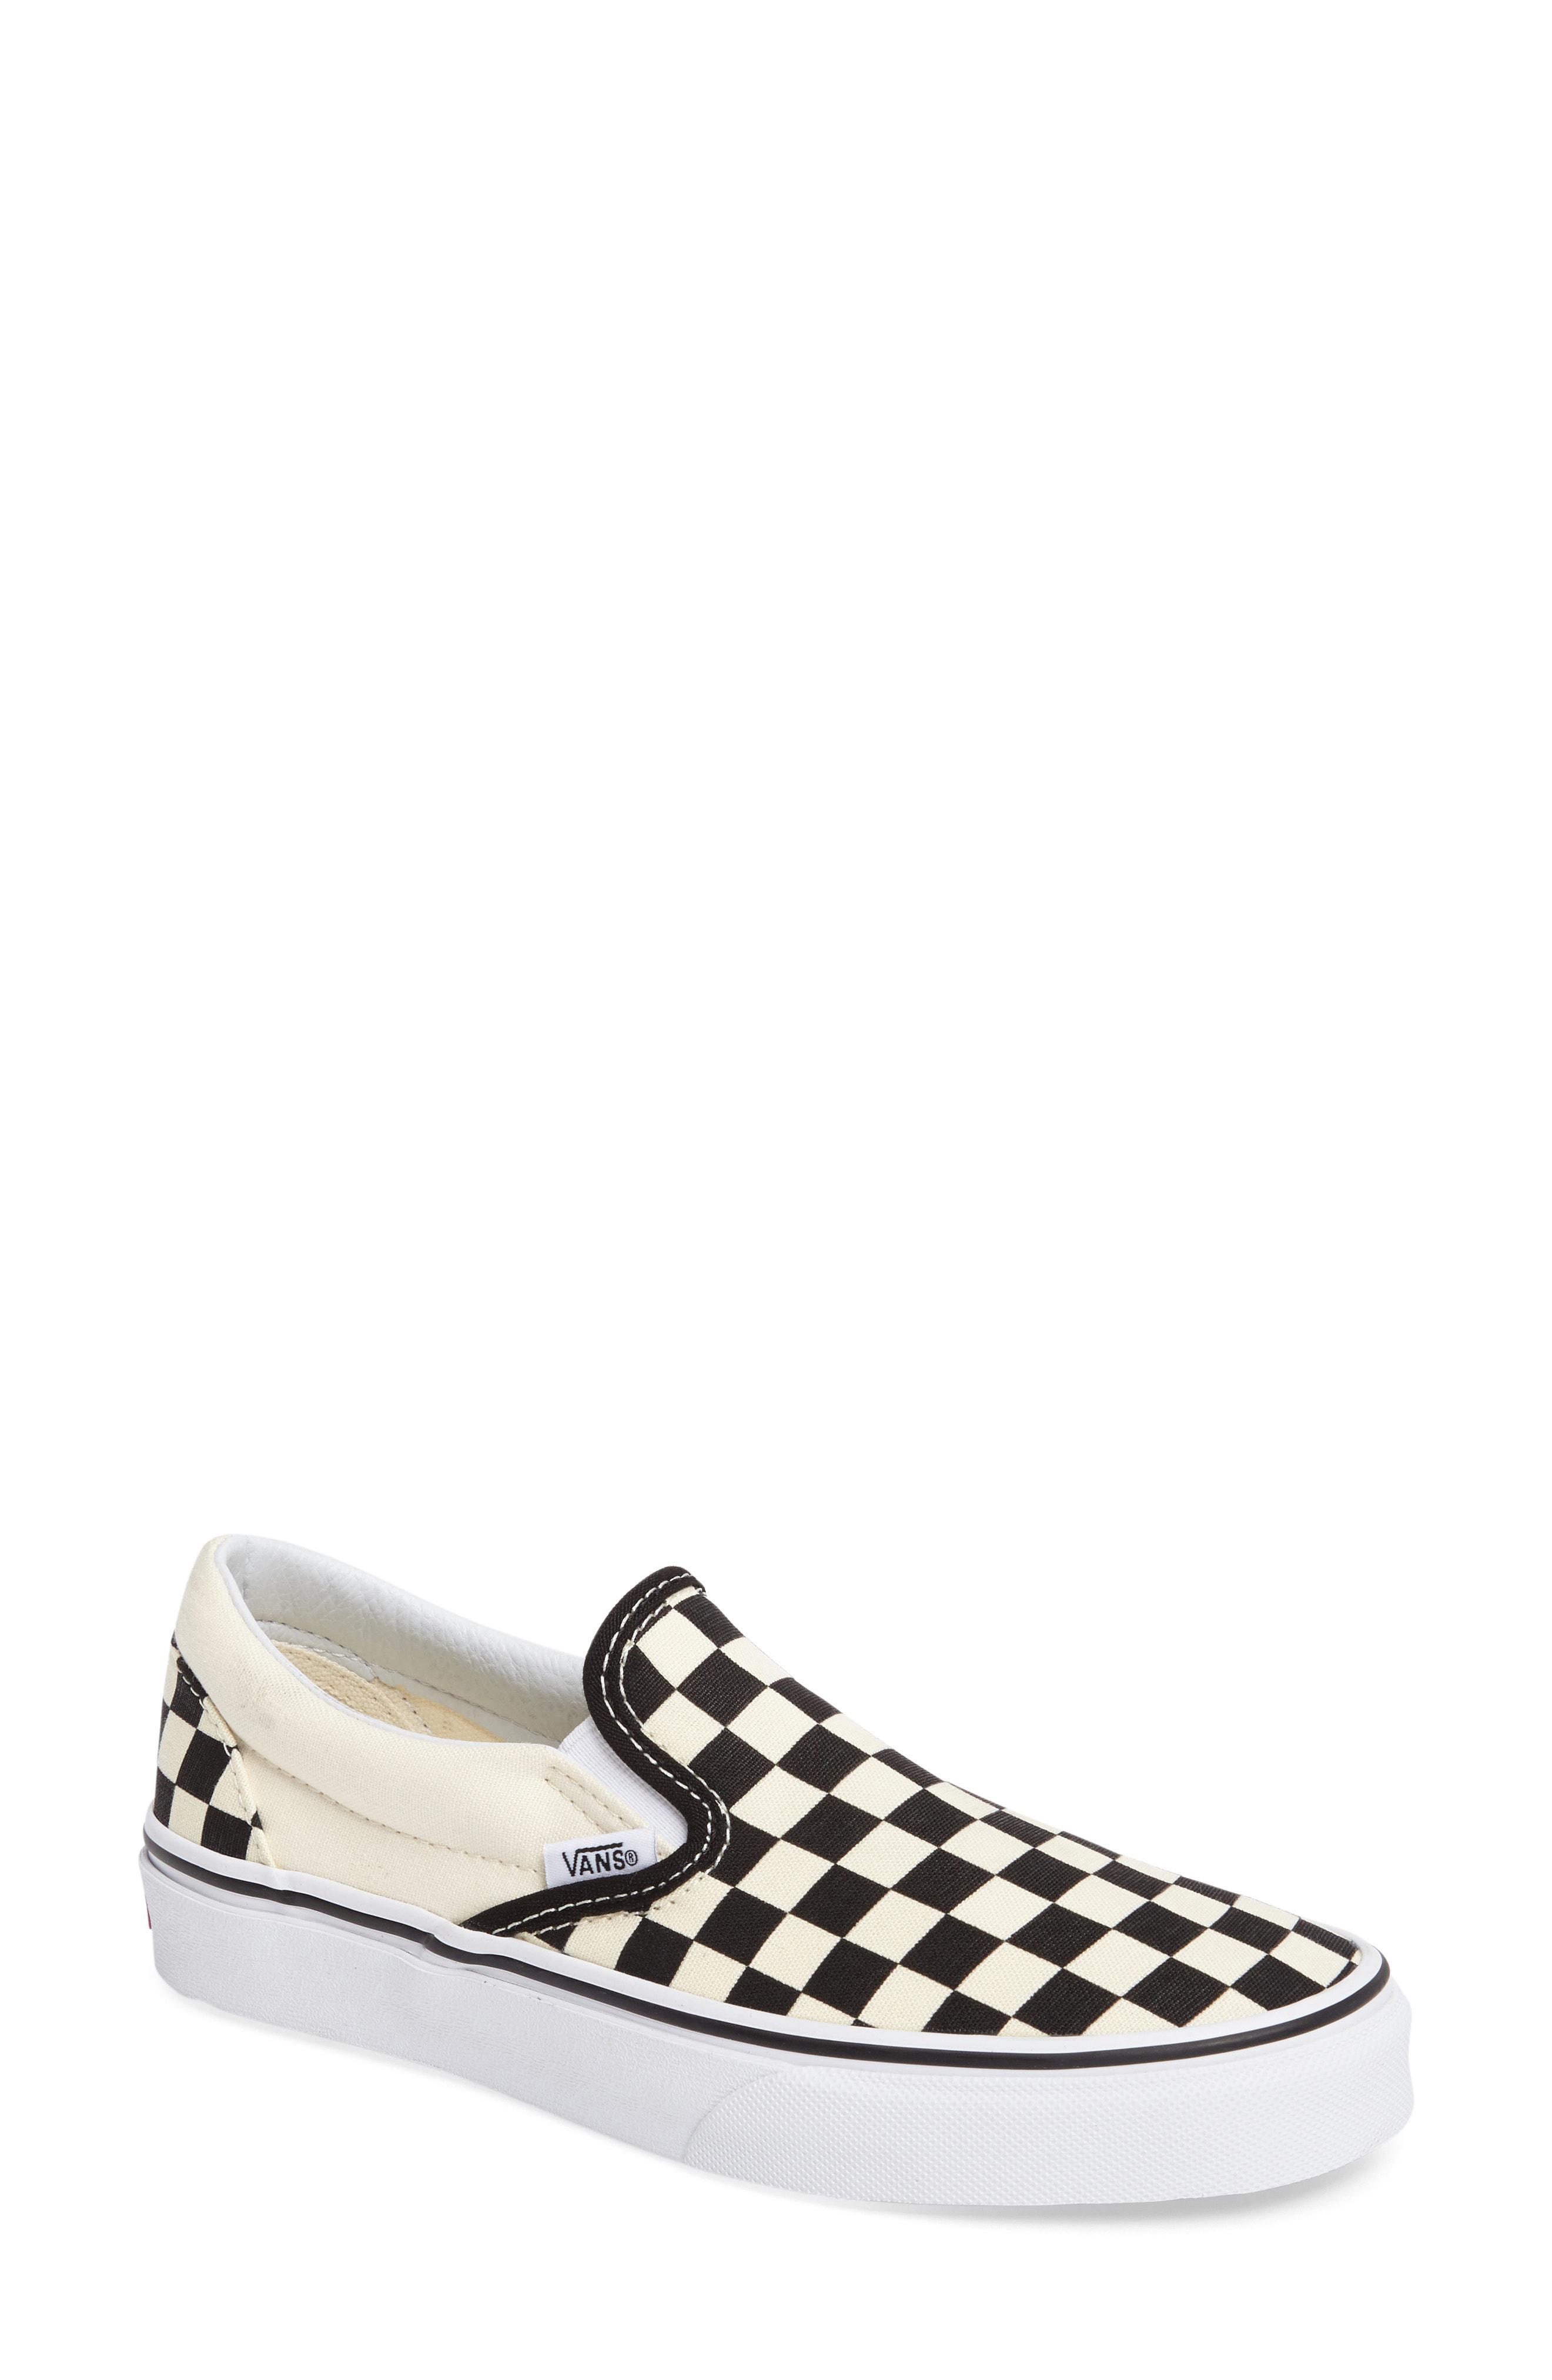 612f437c43 Vans. Women s Classic Slip-on Sneaker